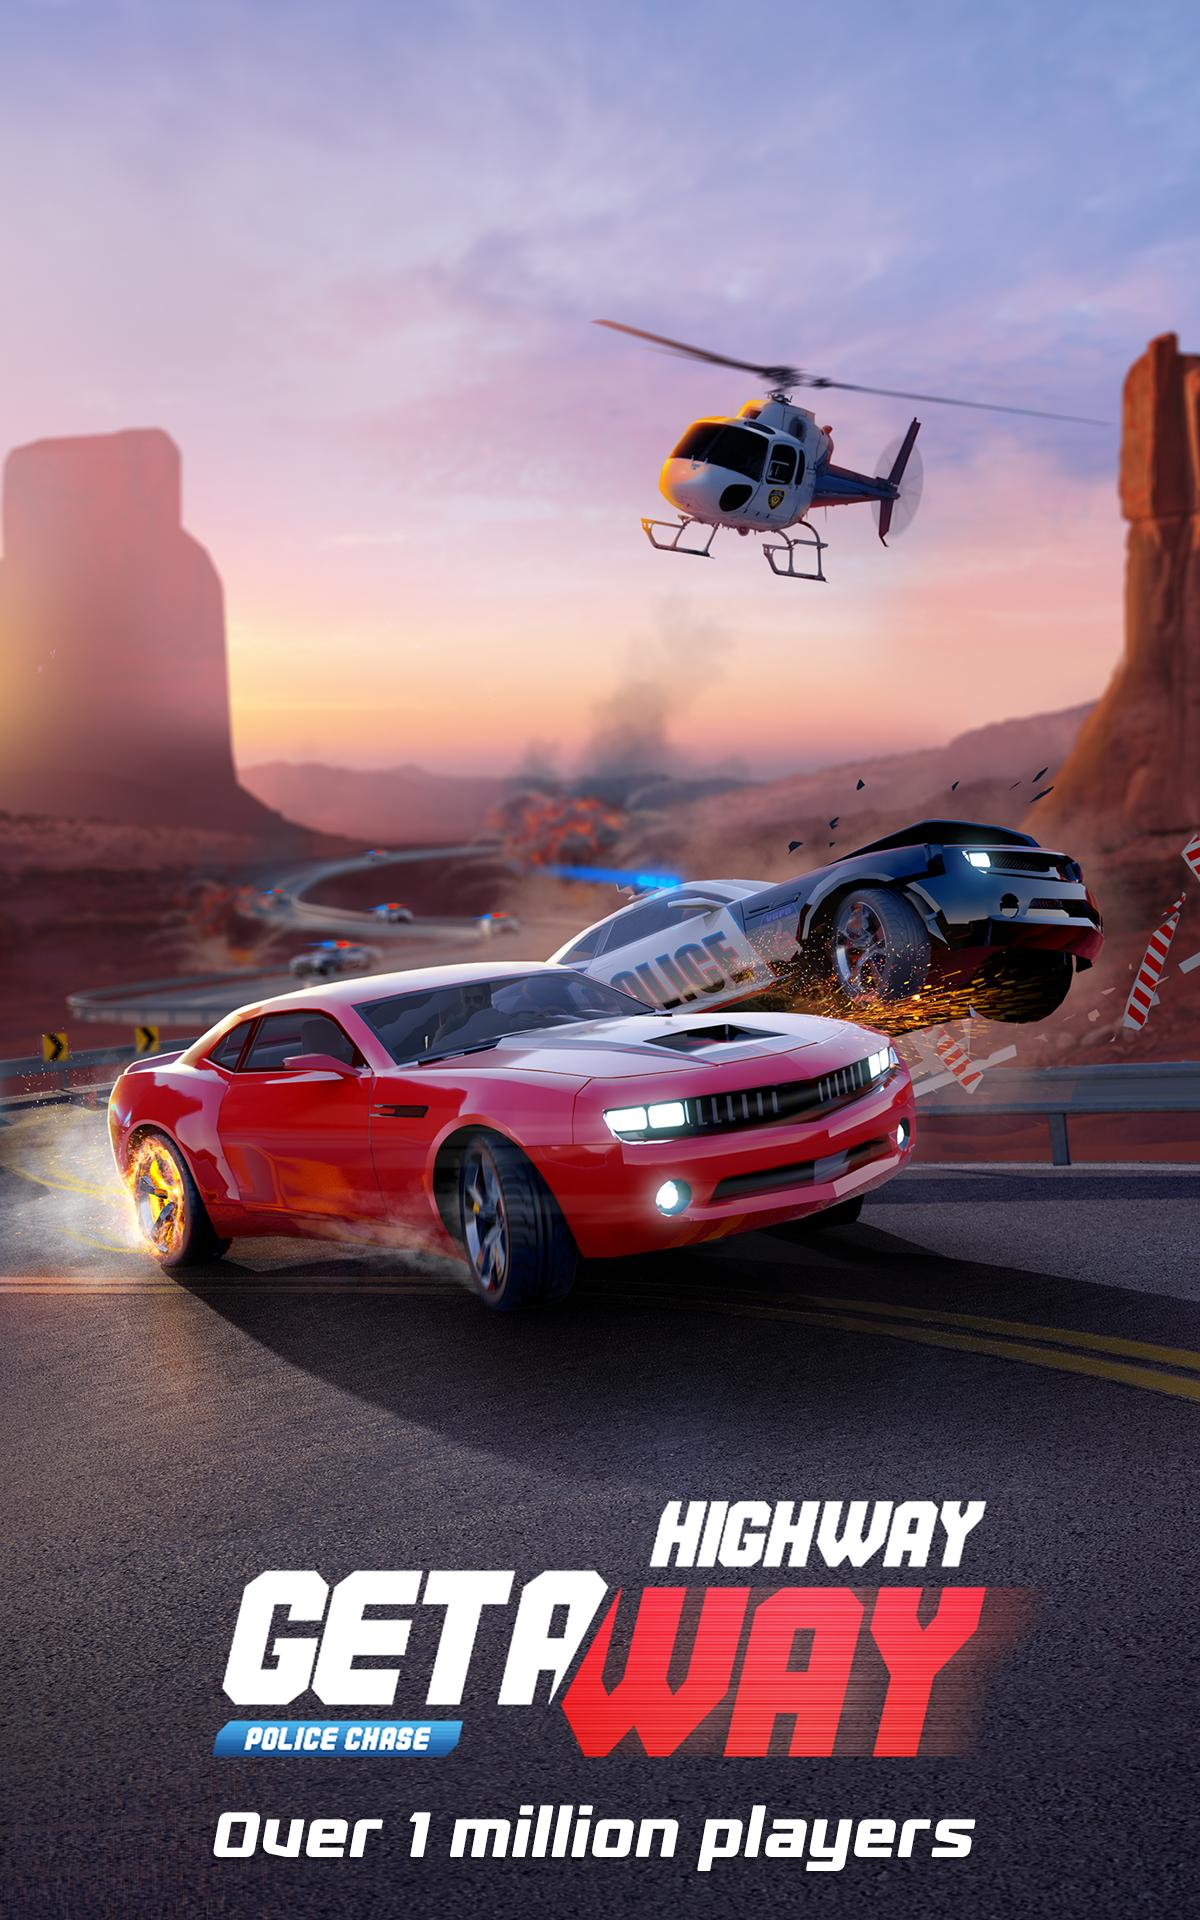 Highway Getaway: Police Chase 1.2.2 Screenshot 1